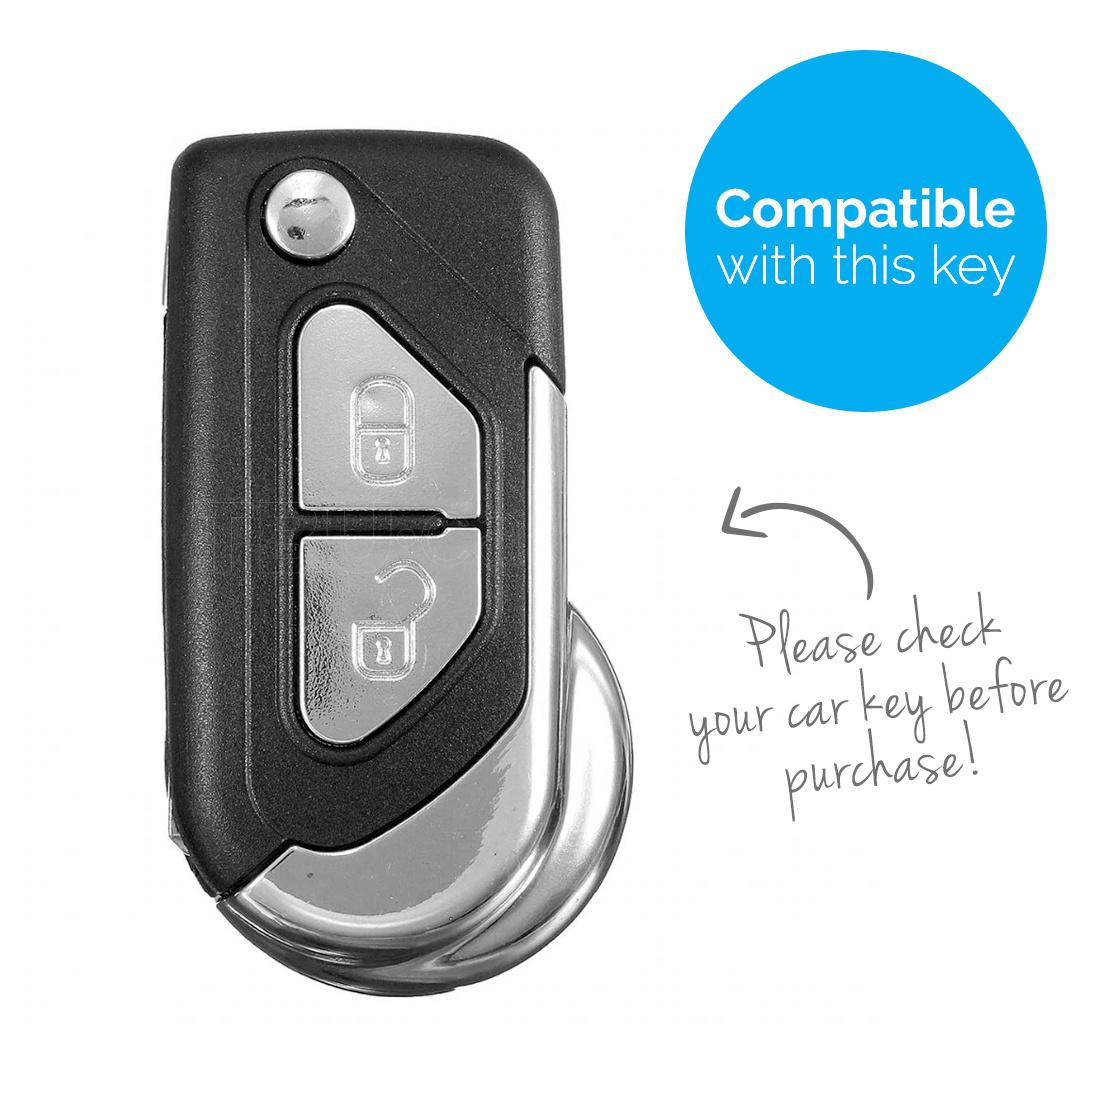 TBU car TBU car Sleutel cover compatibel met Citroën - Silicone sleutelhoesje - beschermhoesje autosleutel - Zwart